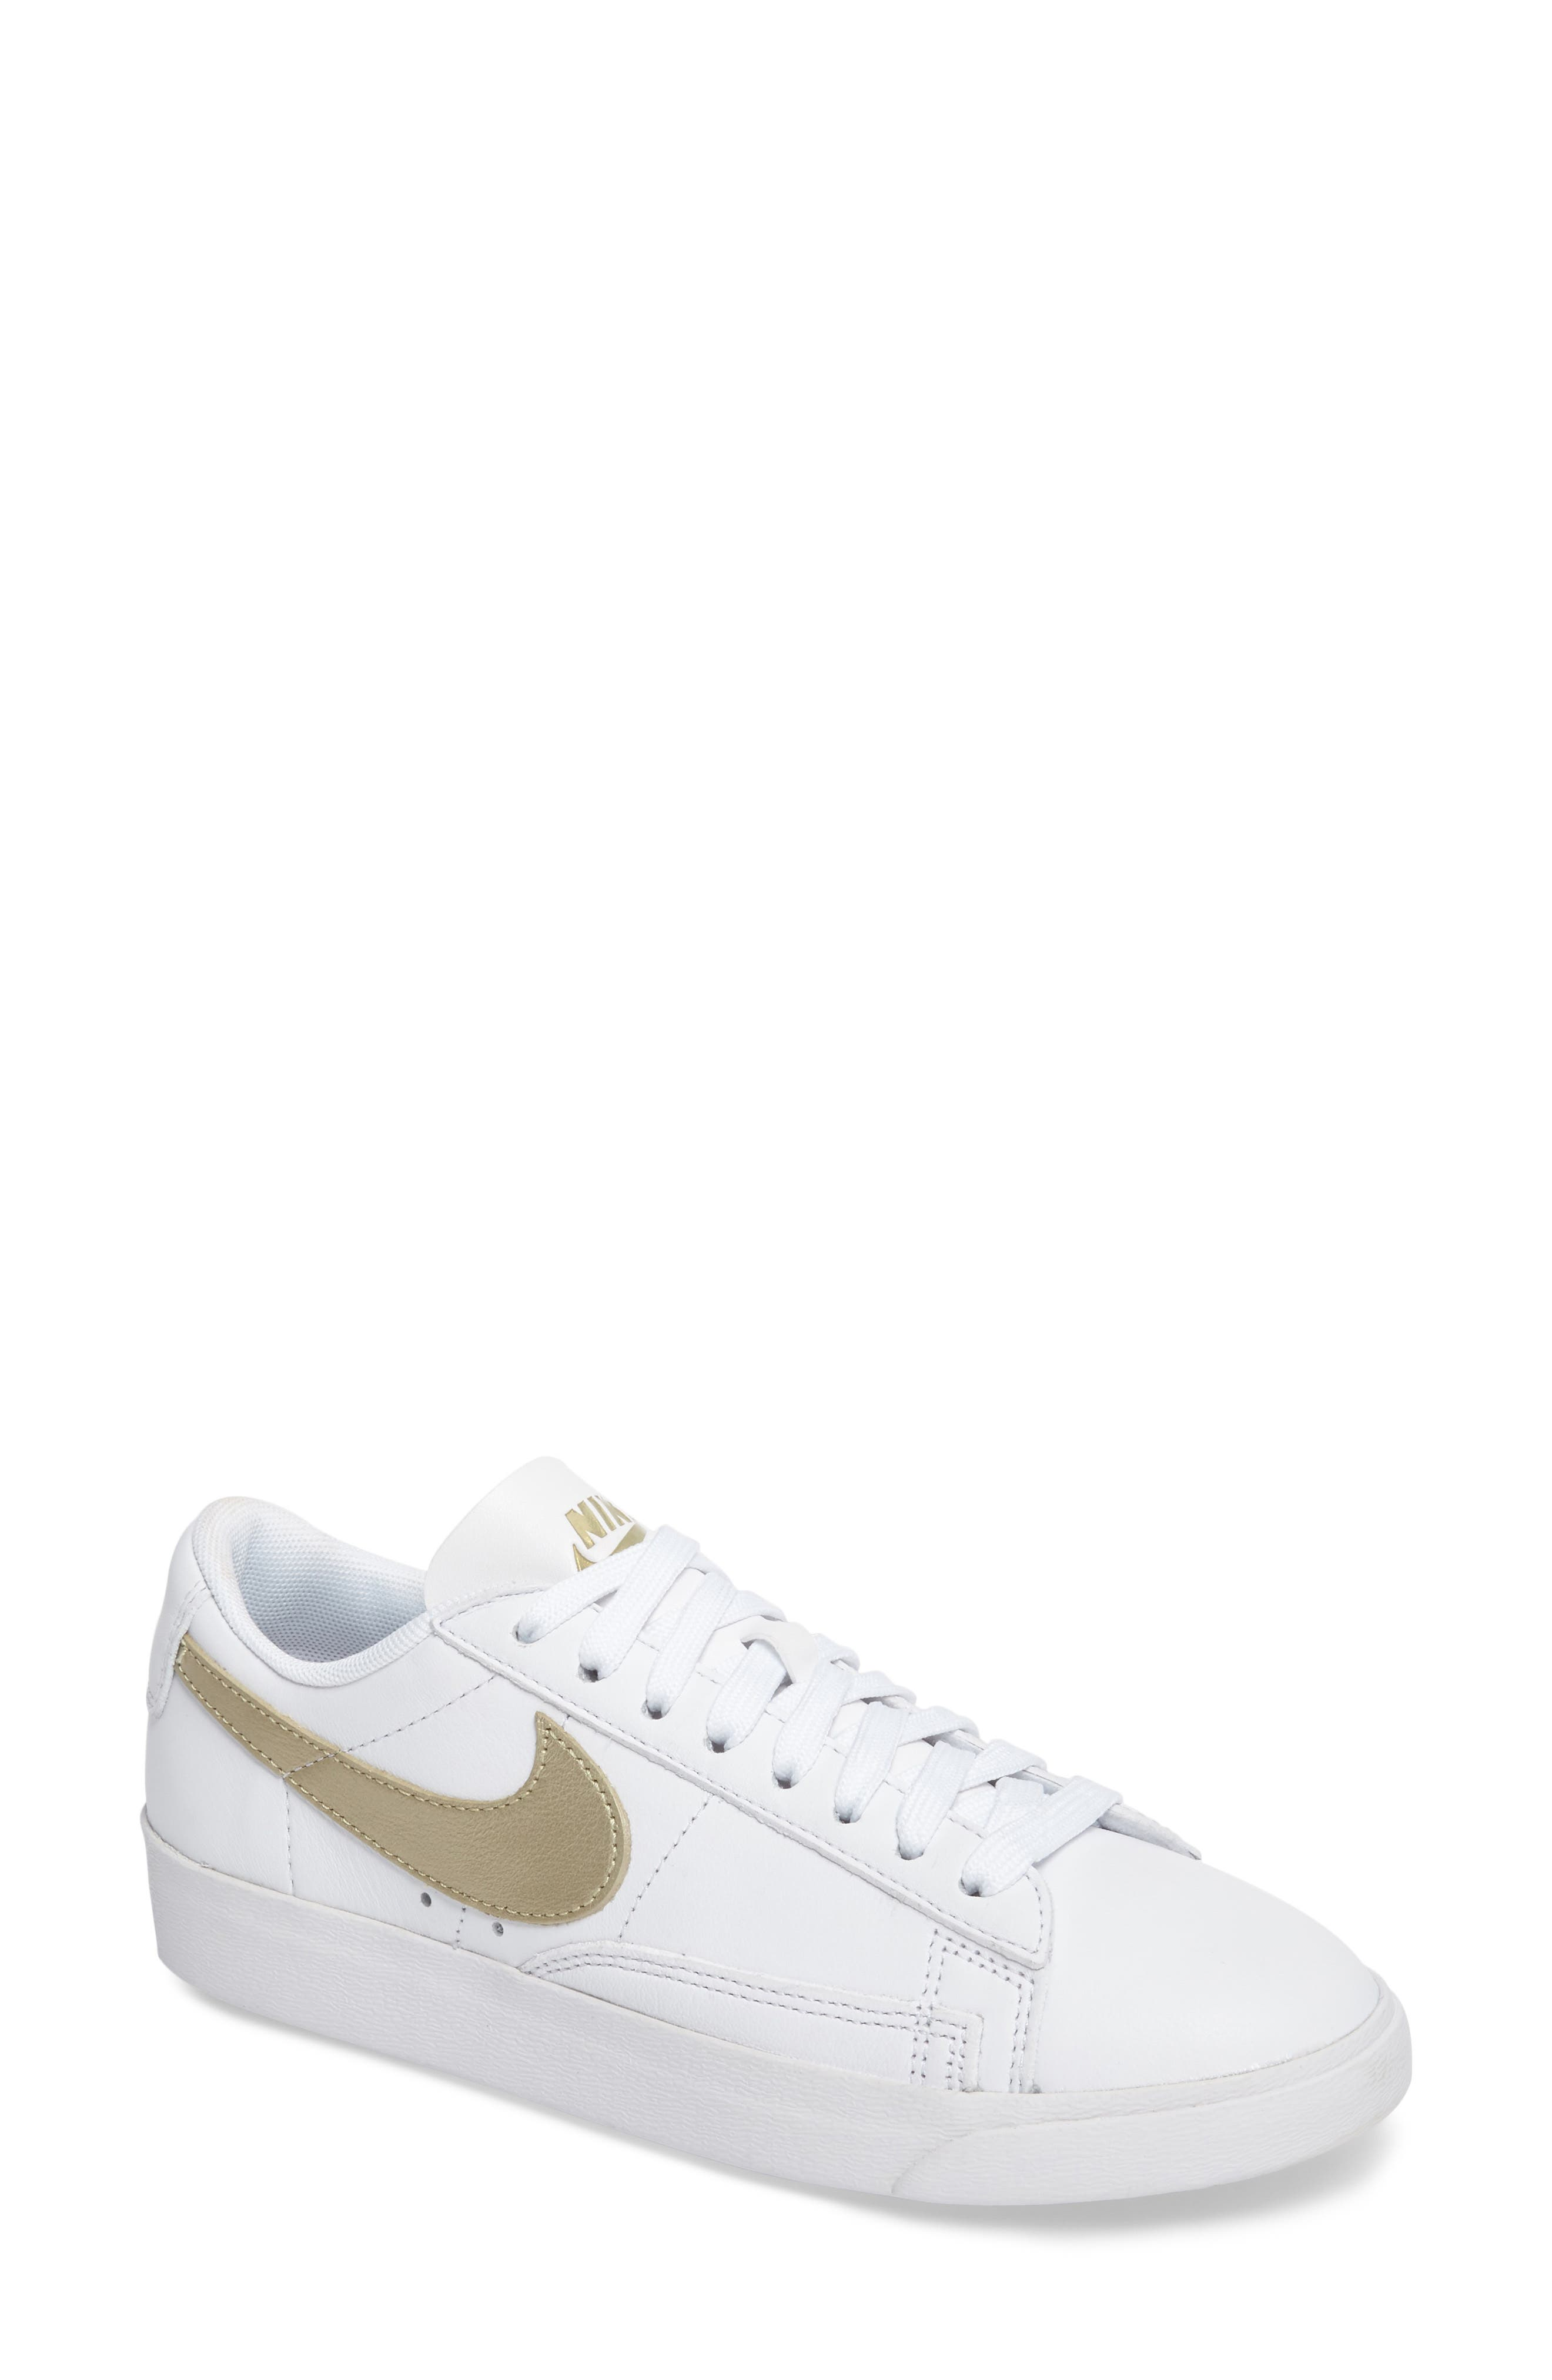 Main Image - Nike Blazer Low LE Basketball Shoe (Women)